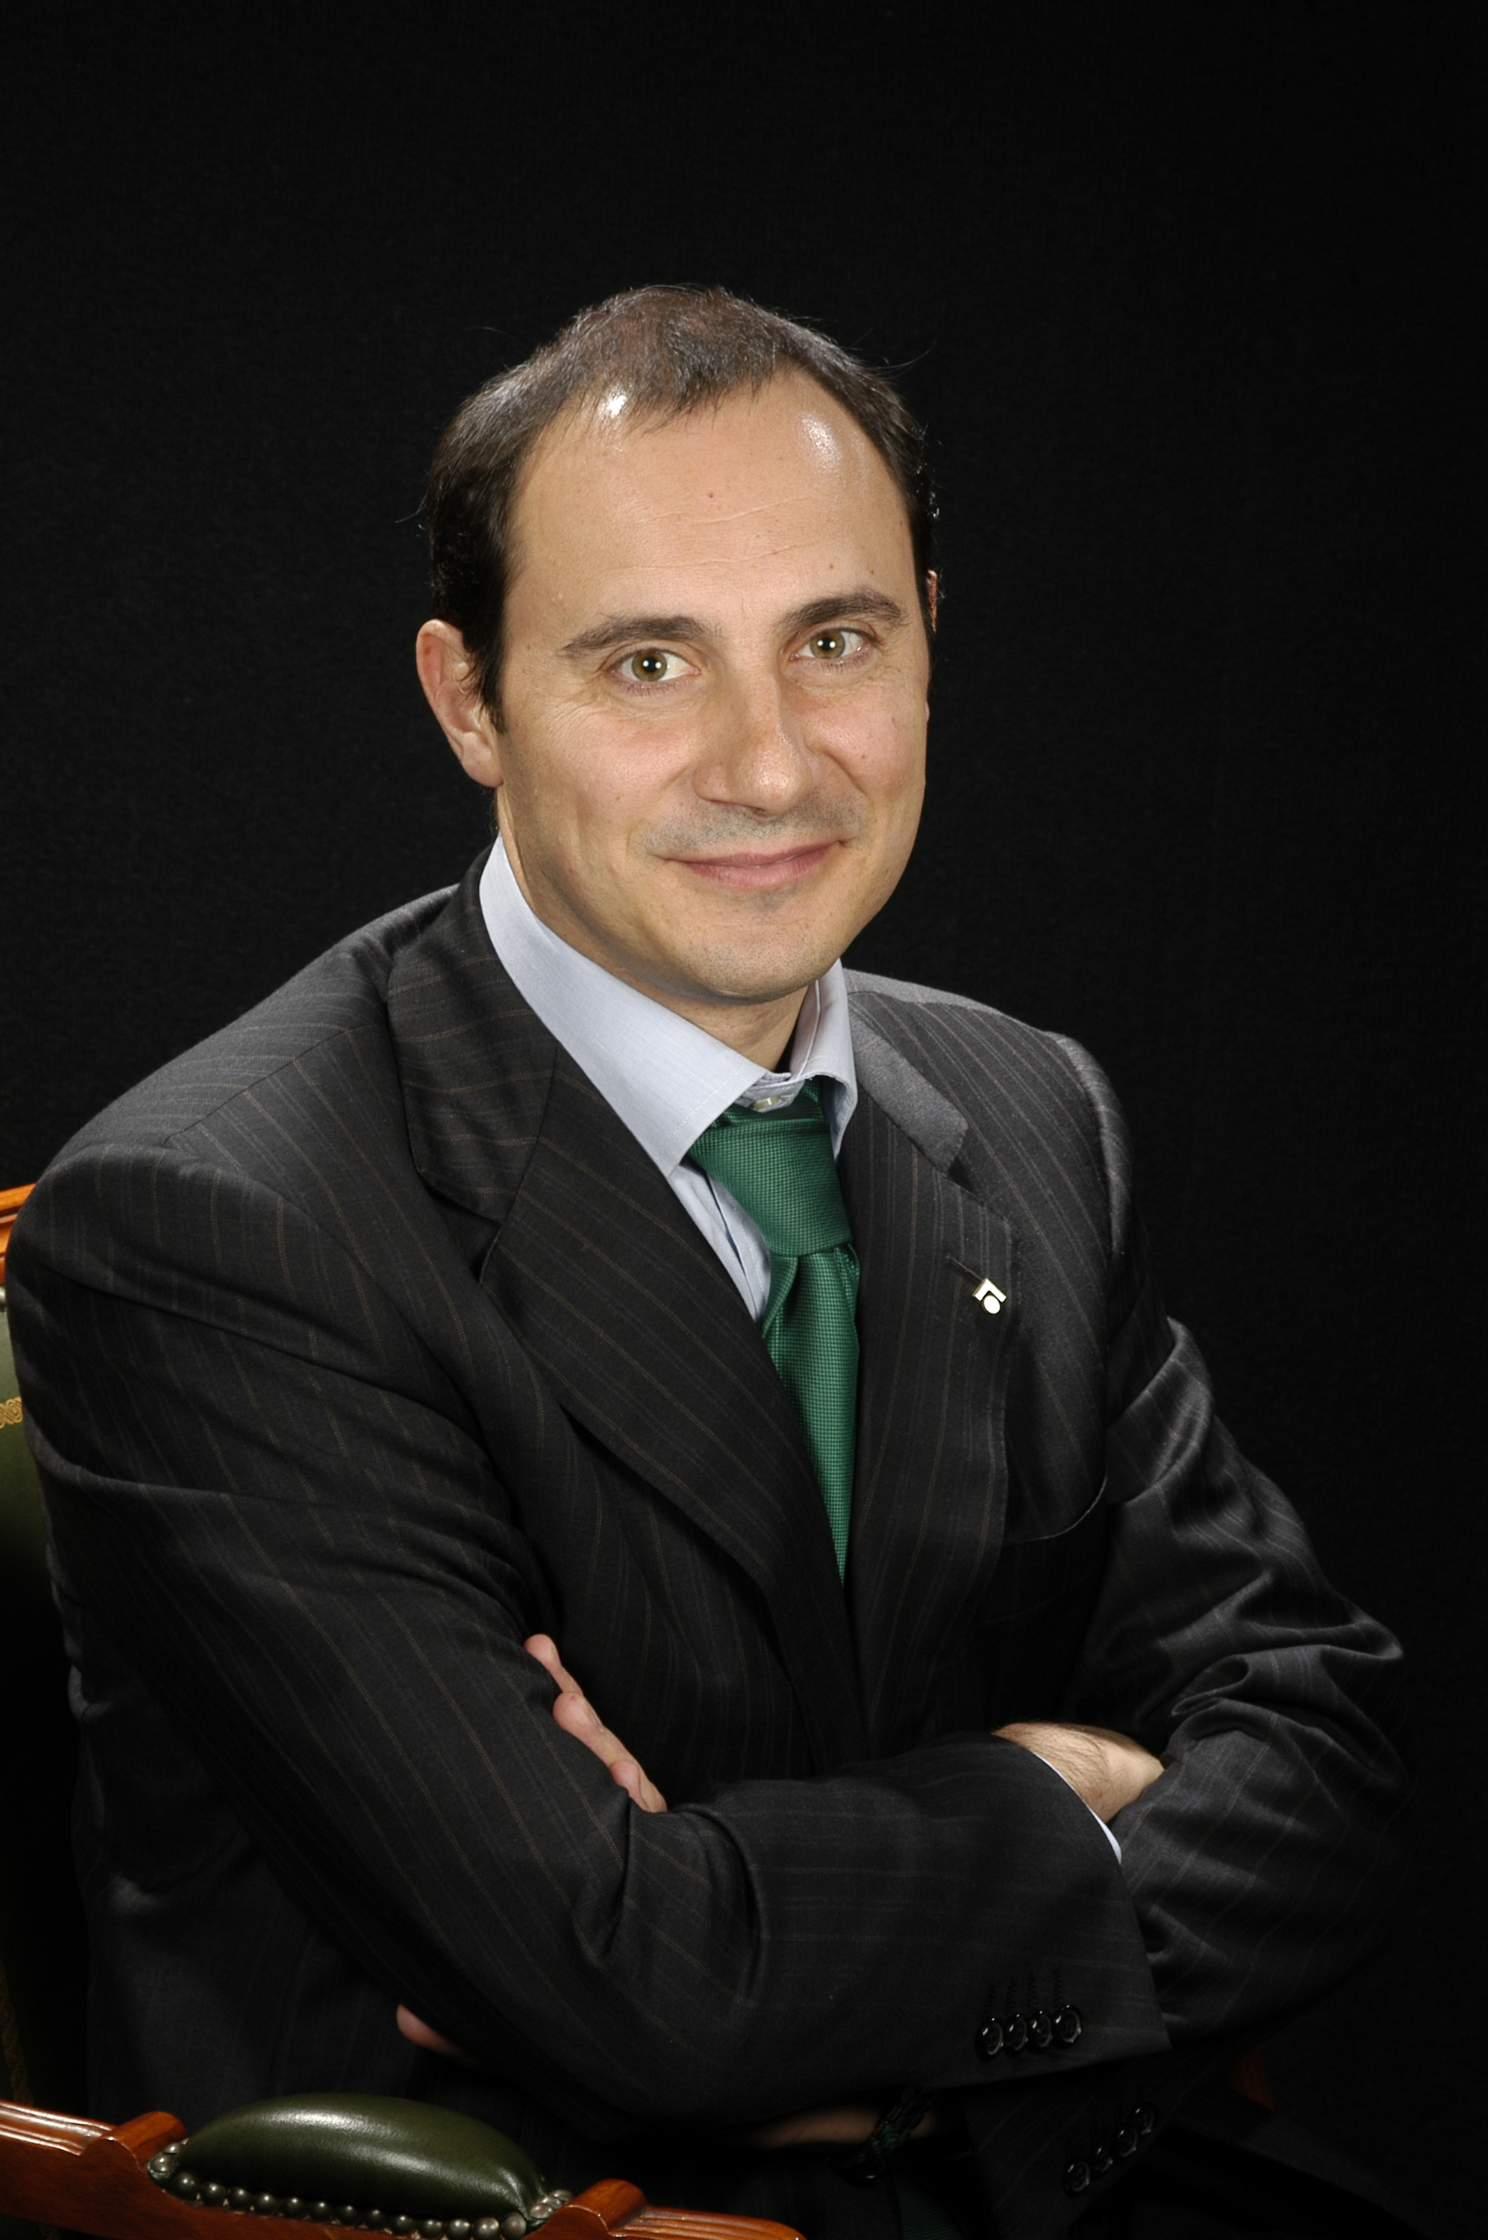 Sr. Angelo Ciacci